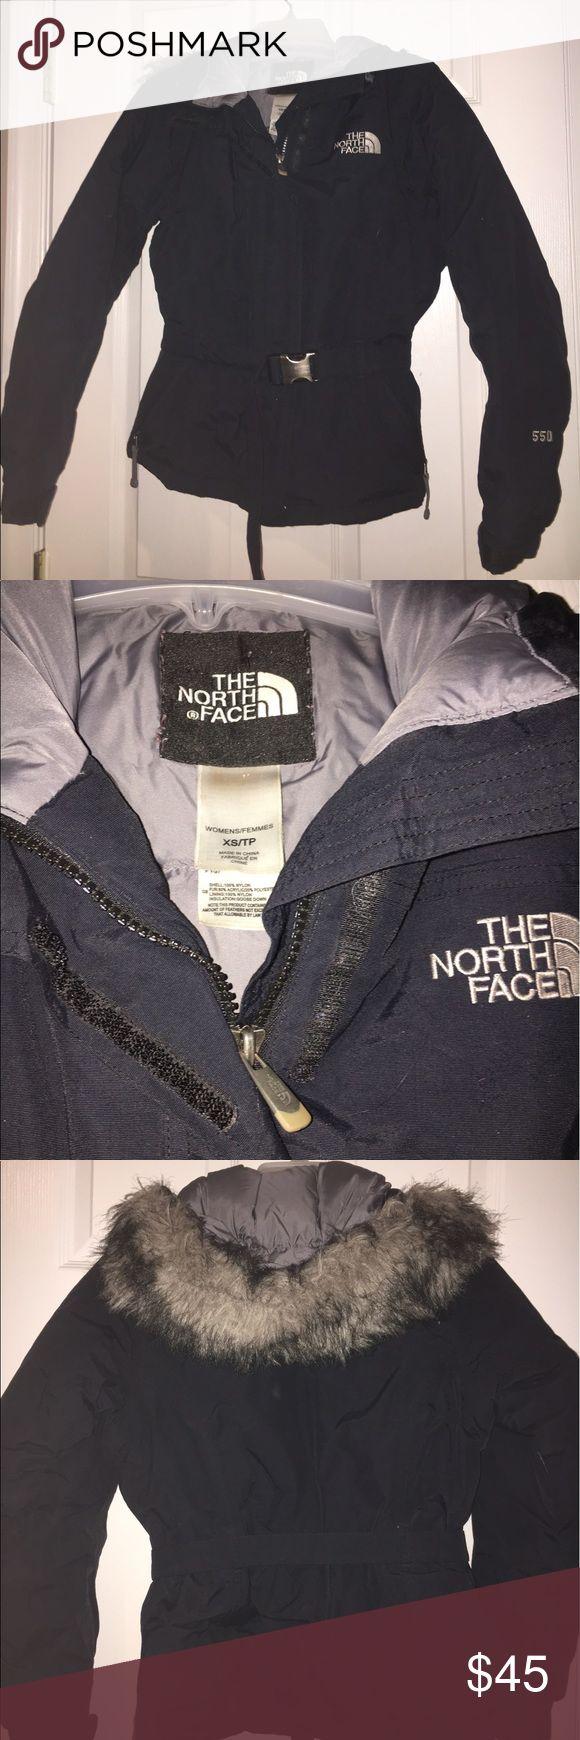 North Face 550 winter coat North Face 550 black winter coat. North Face Jackets & Coats Puffers